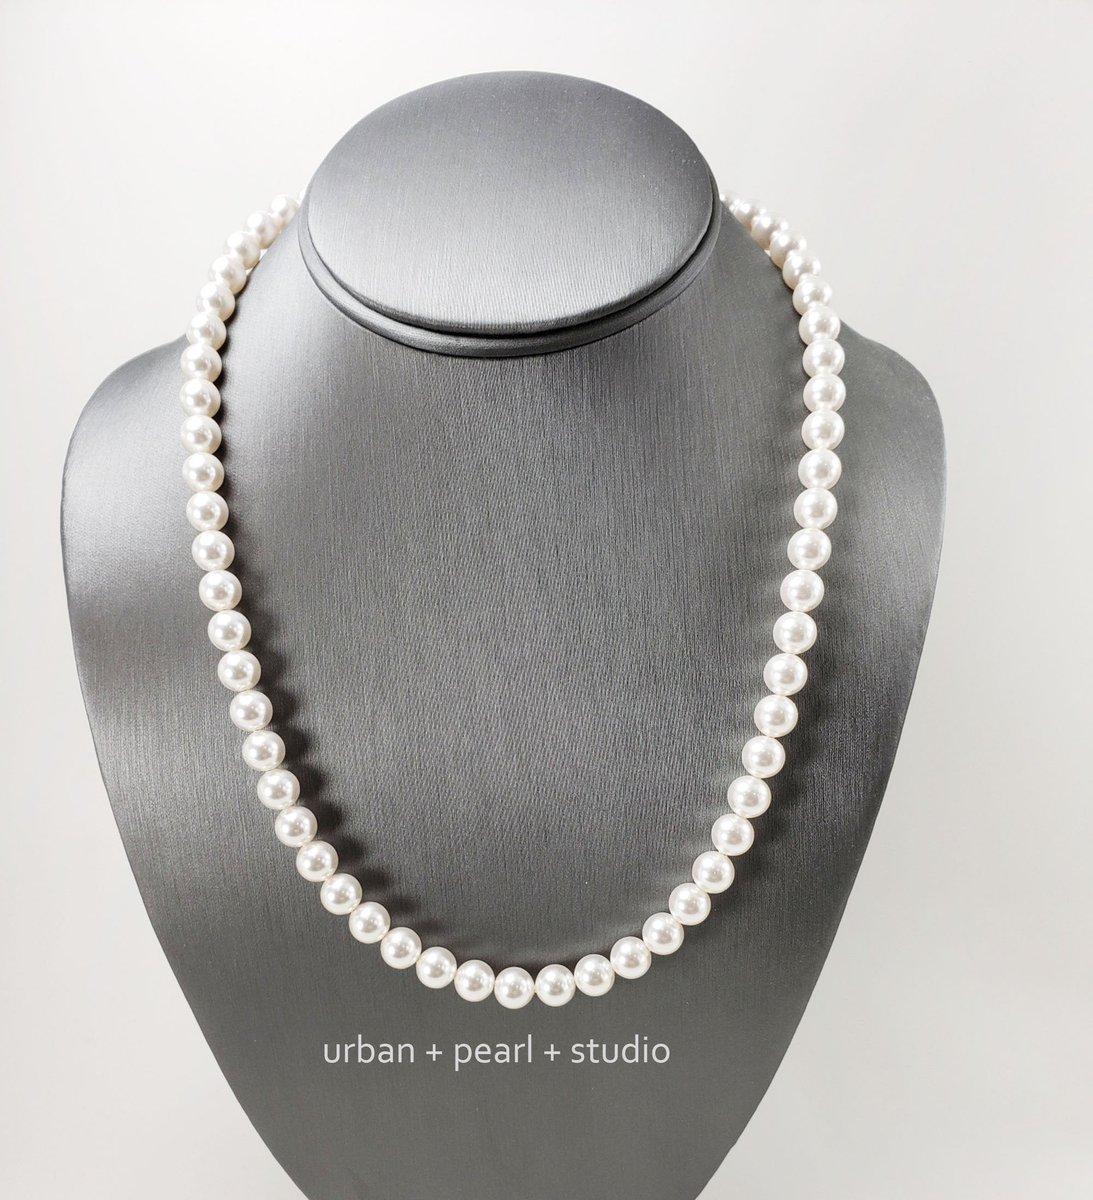 Men's Pearl Necklace 20 Inch Swarovski Pearl Choker Necklace For Guys 24 Inch Harry Pearls  #pearlnecklace #handmade #lovejewelry #giftsforher #etsy #handmadejewelry